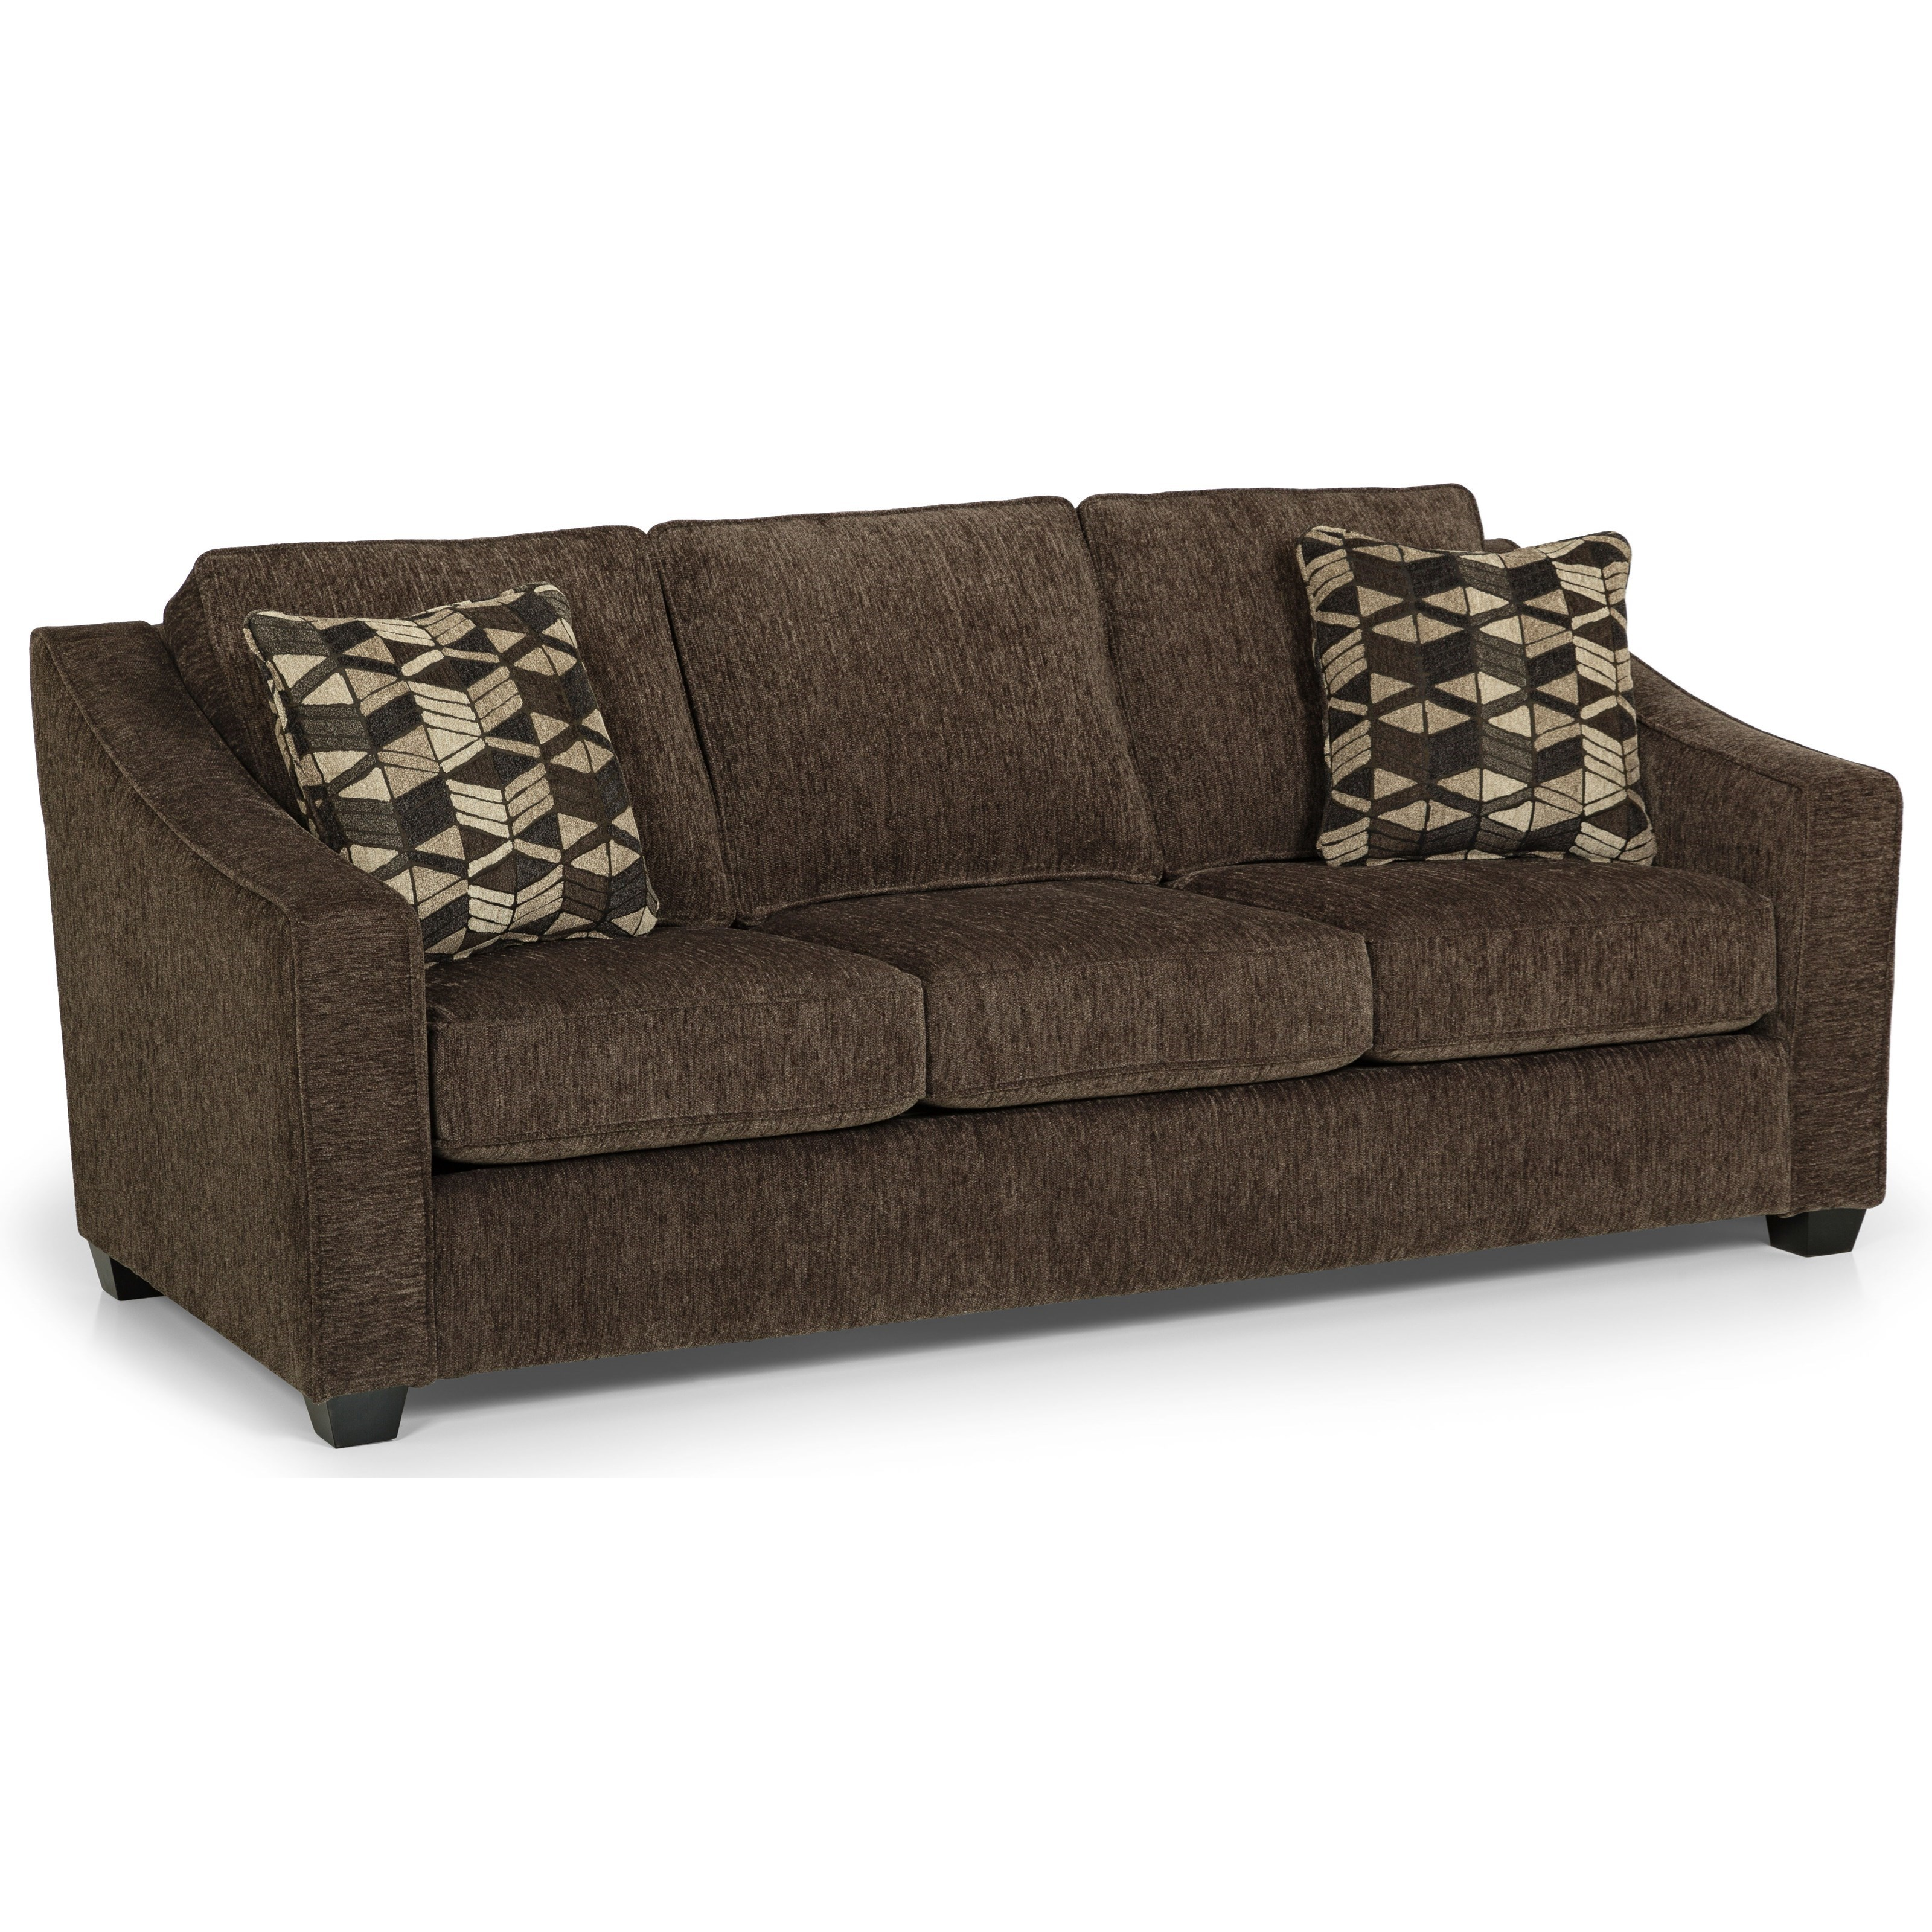 496 Queen Sleeper by Stanton at Wilson's Furniture